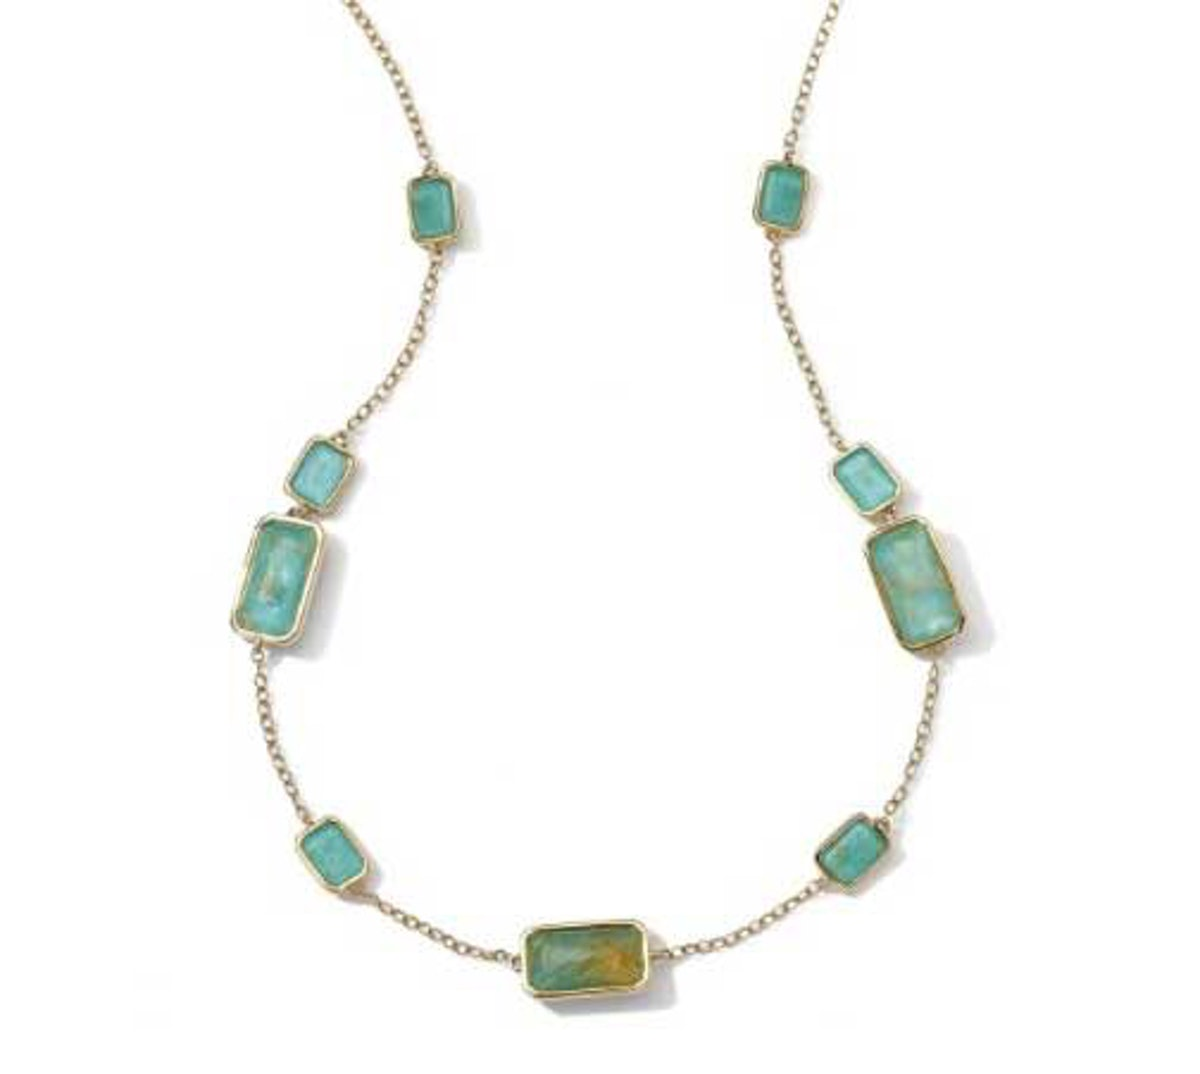 Ippolita 18K Gold Rock necklace